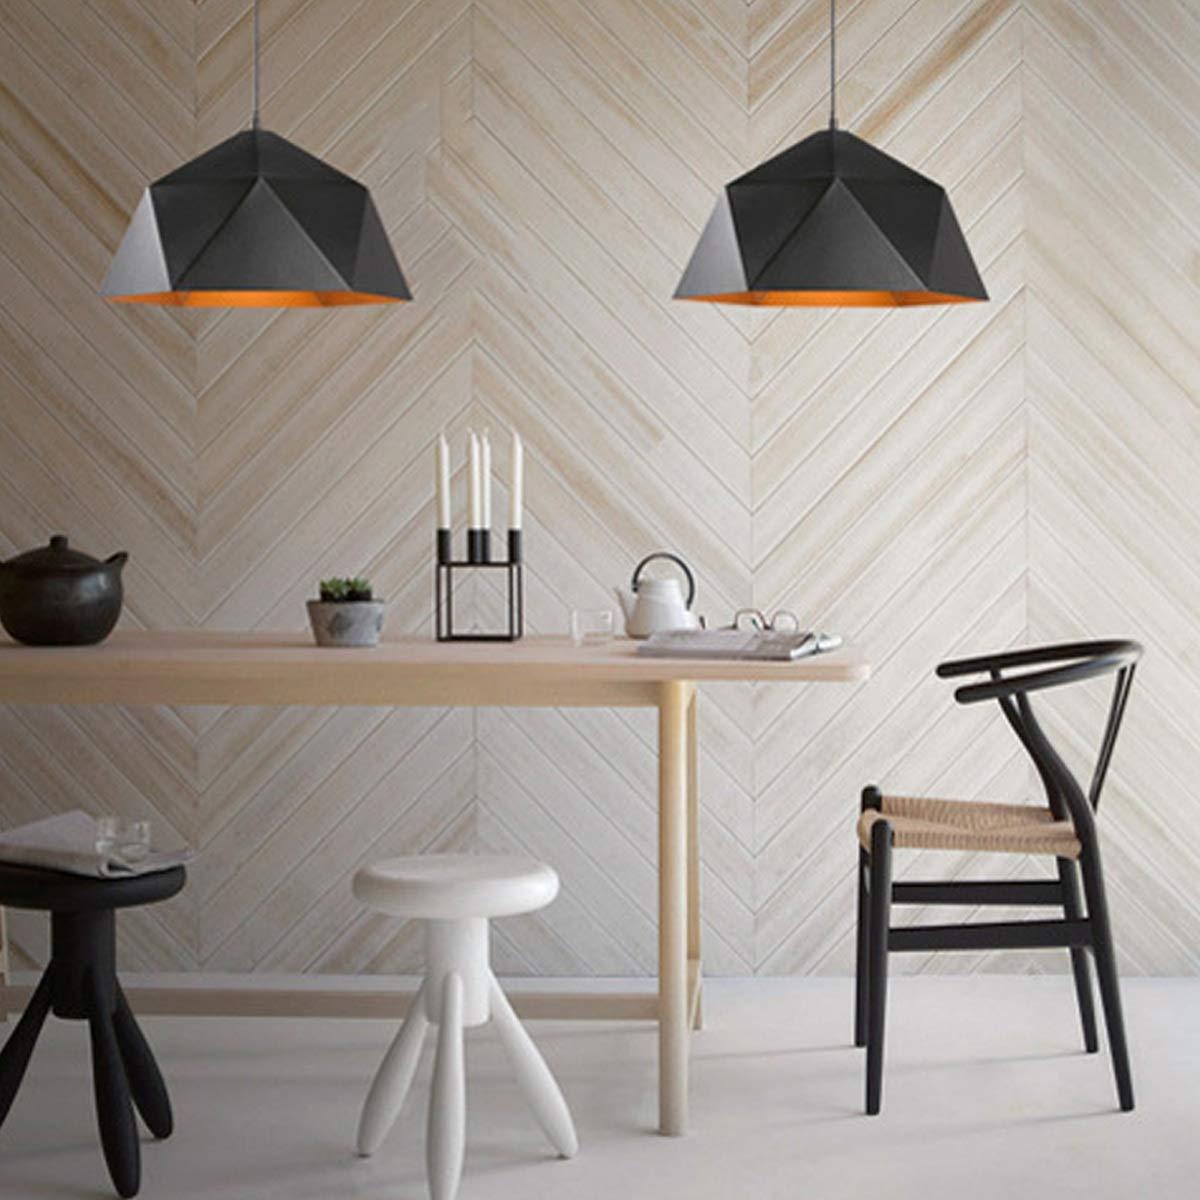 NANGE Wrought Iron Diamond Pendant Lamp, Industrial Wind Ancient Ways Geometry Pot Droplight,Cafe Restaurant Chandelier,E27(Without Light Source) (Color : Black, Size : AC 110V) by NANGE (Image #8)